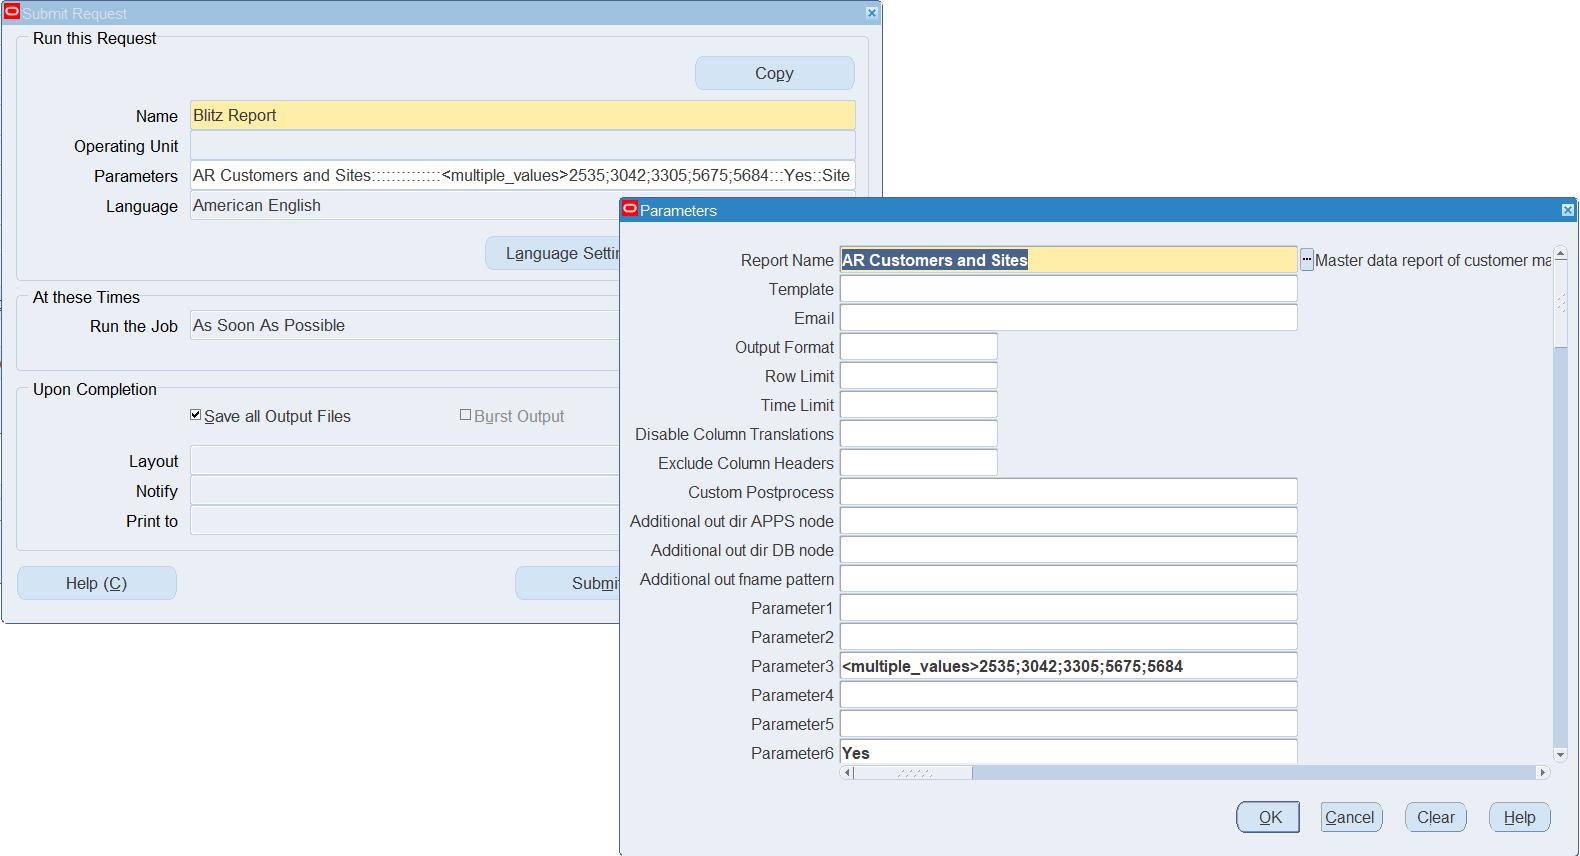 Blitz Report custom postprocess